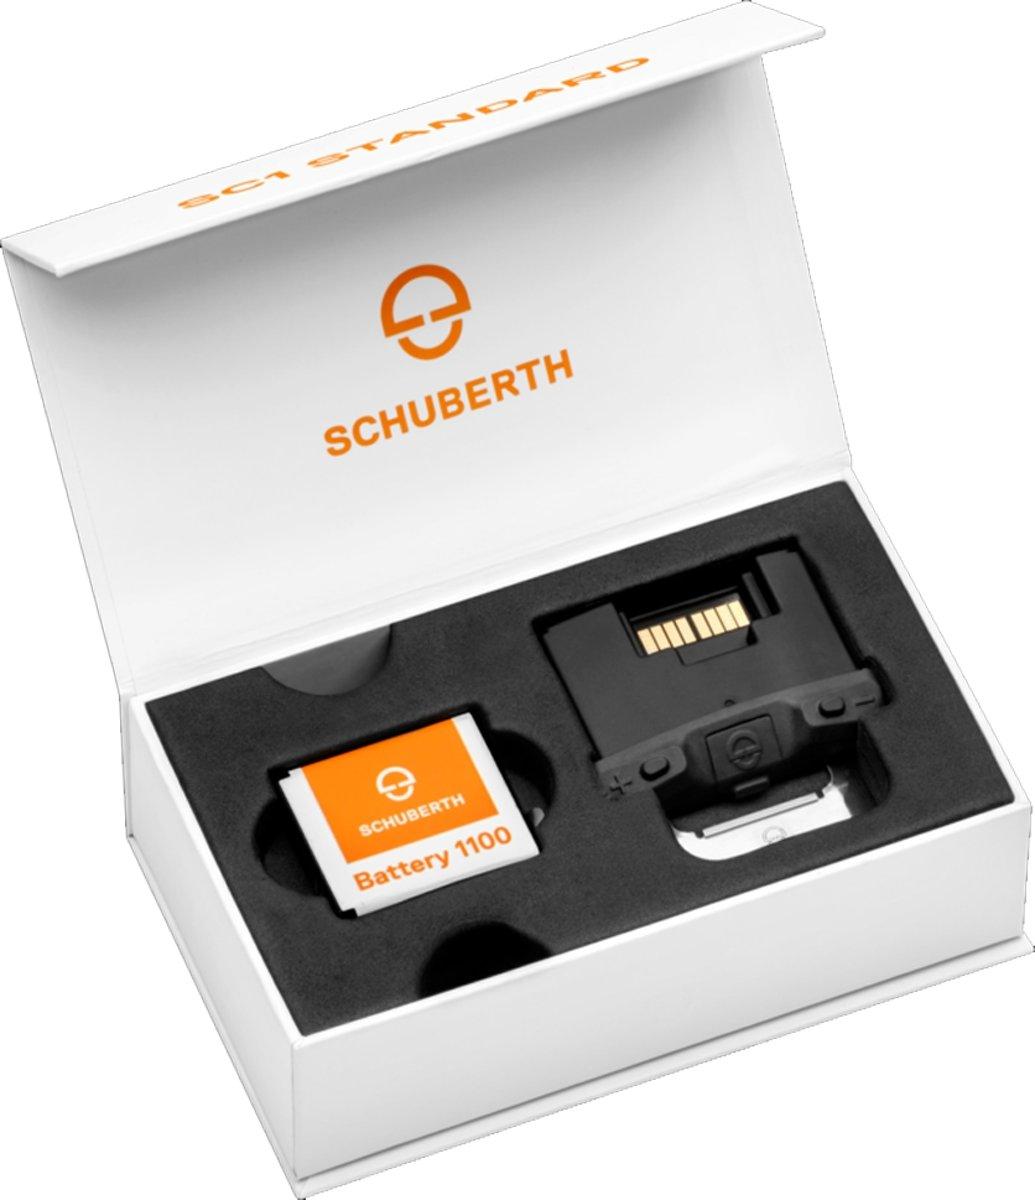 Schuberth Motorhelm Communicatie Systeem SC1 Advanced C4 / R2 kopen